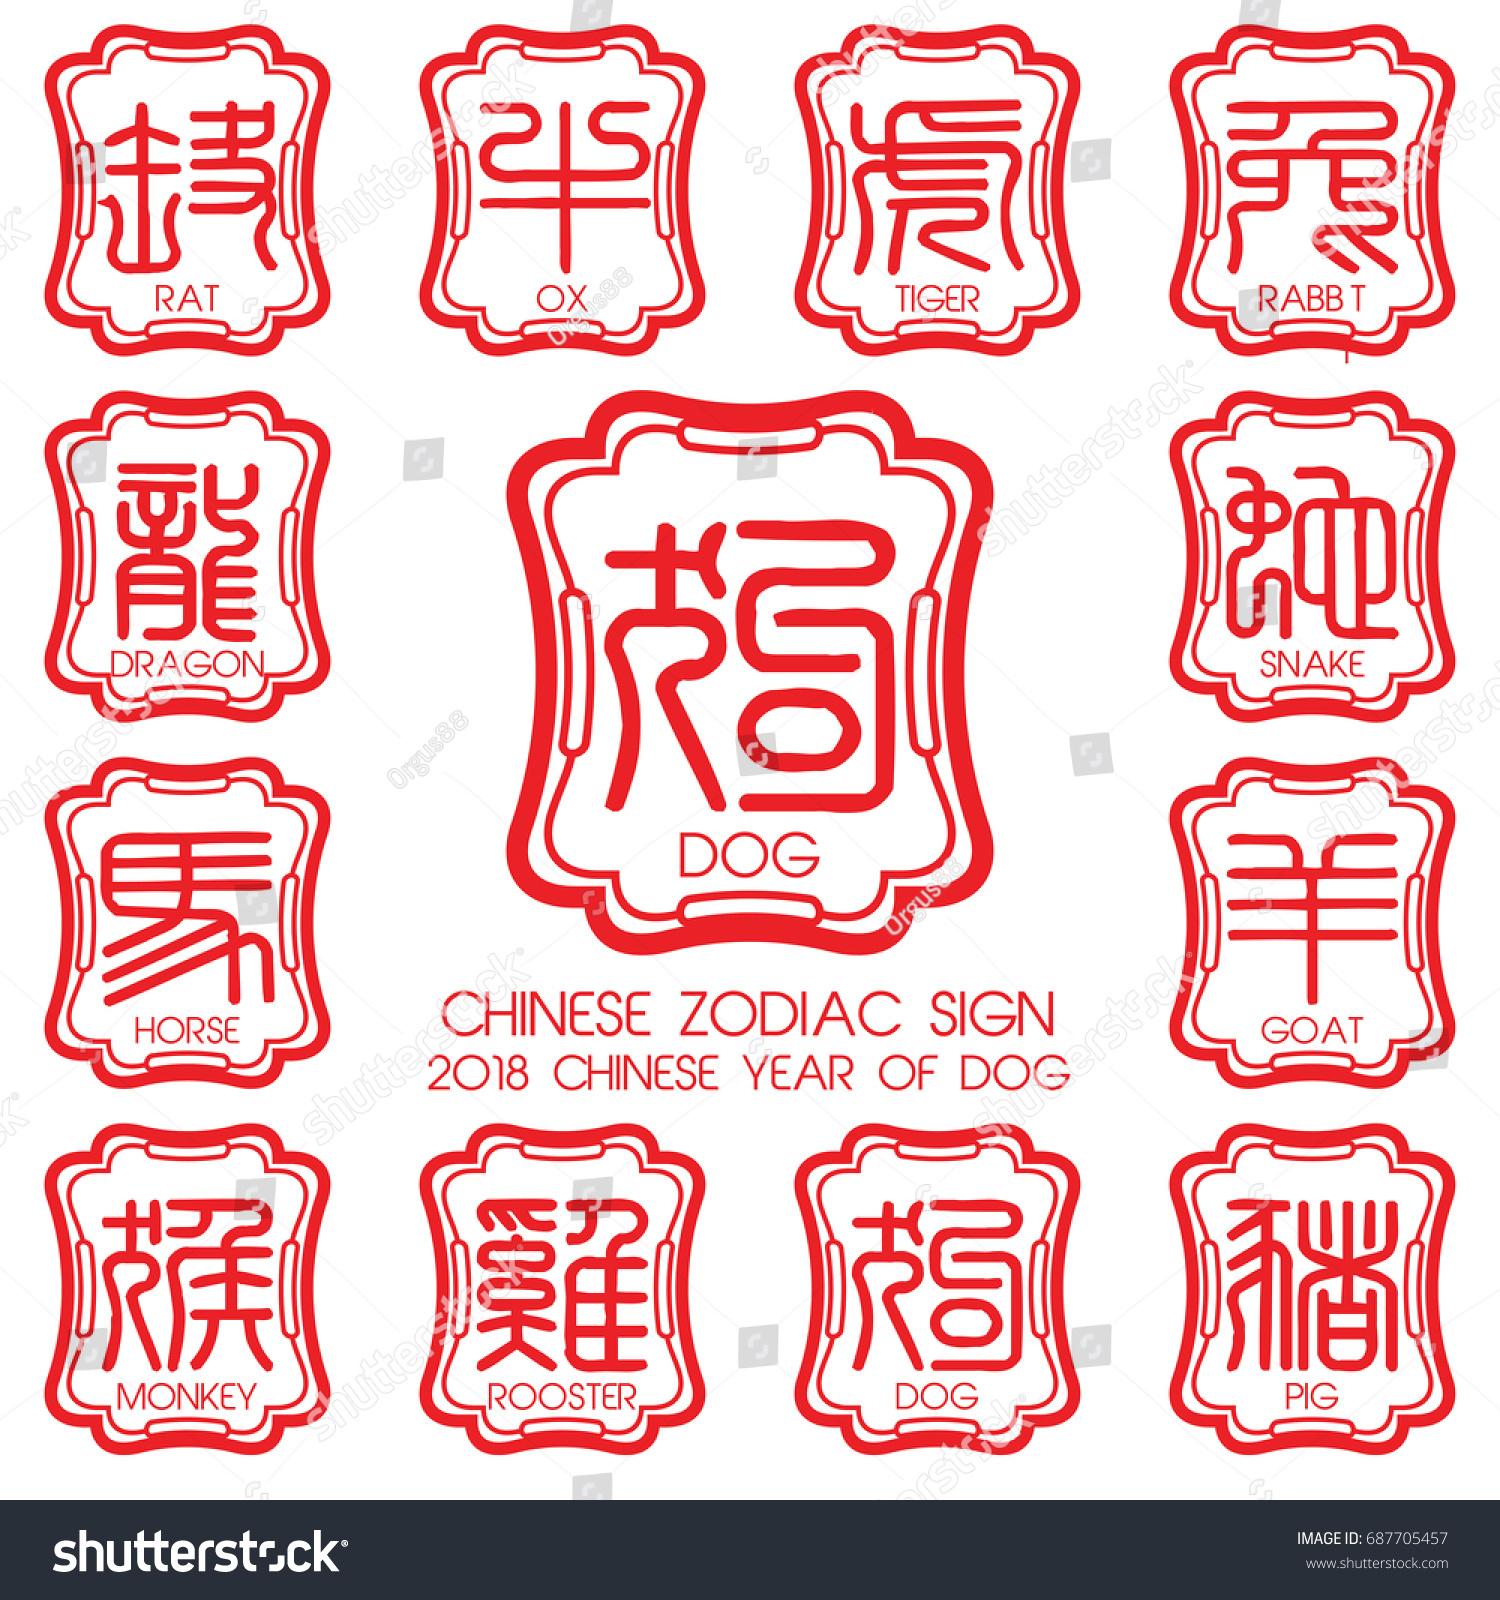 12 Chinese Zodiac Symbols 2018 Year Stock Vector Royalty Free